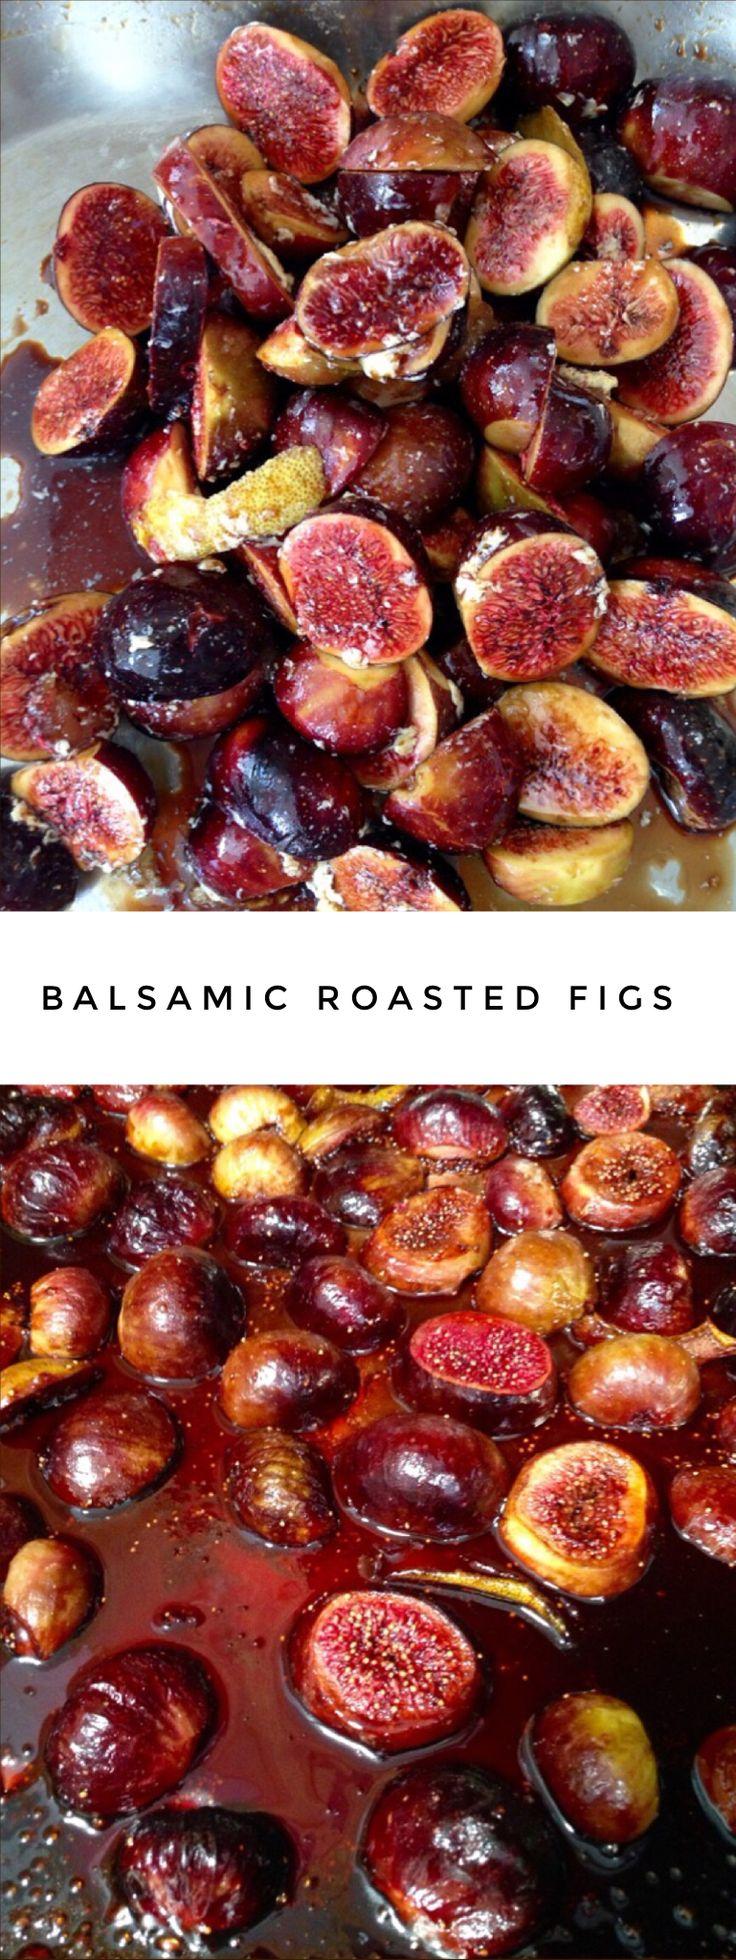 Balsamic Roasted Figs Recipe | CiaoFlorentina.com @CiaoFlorentina